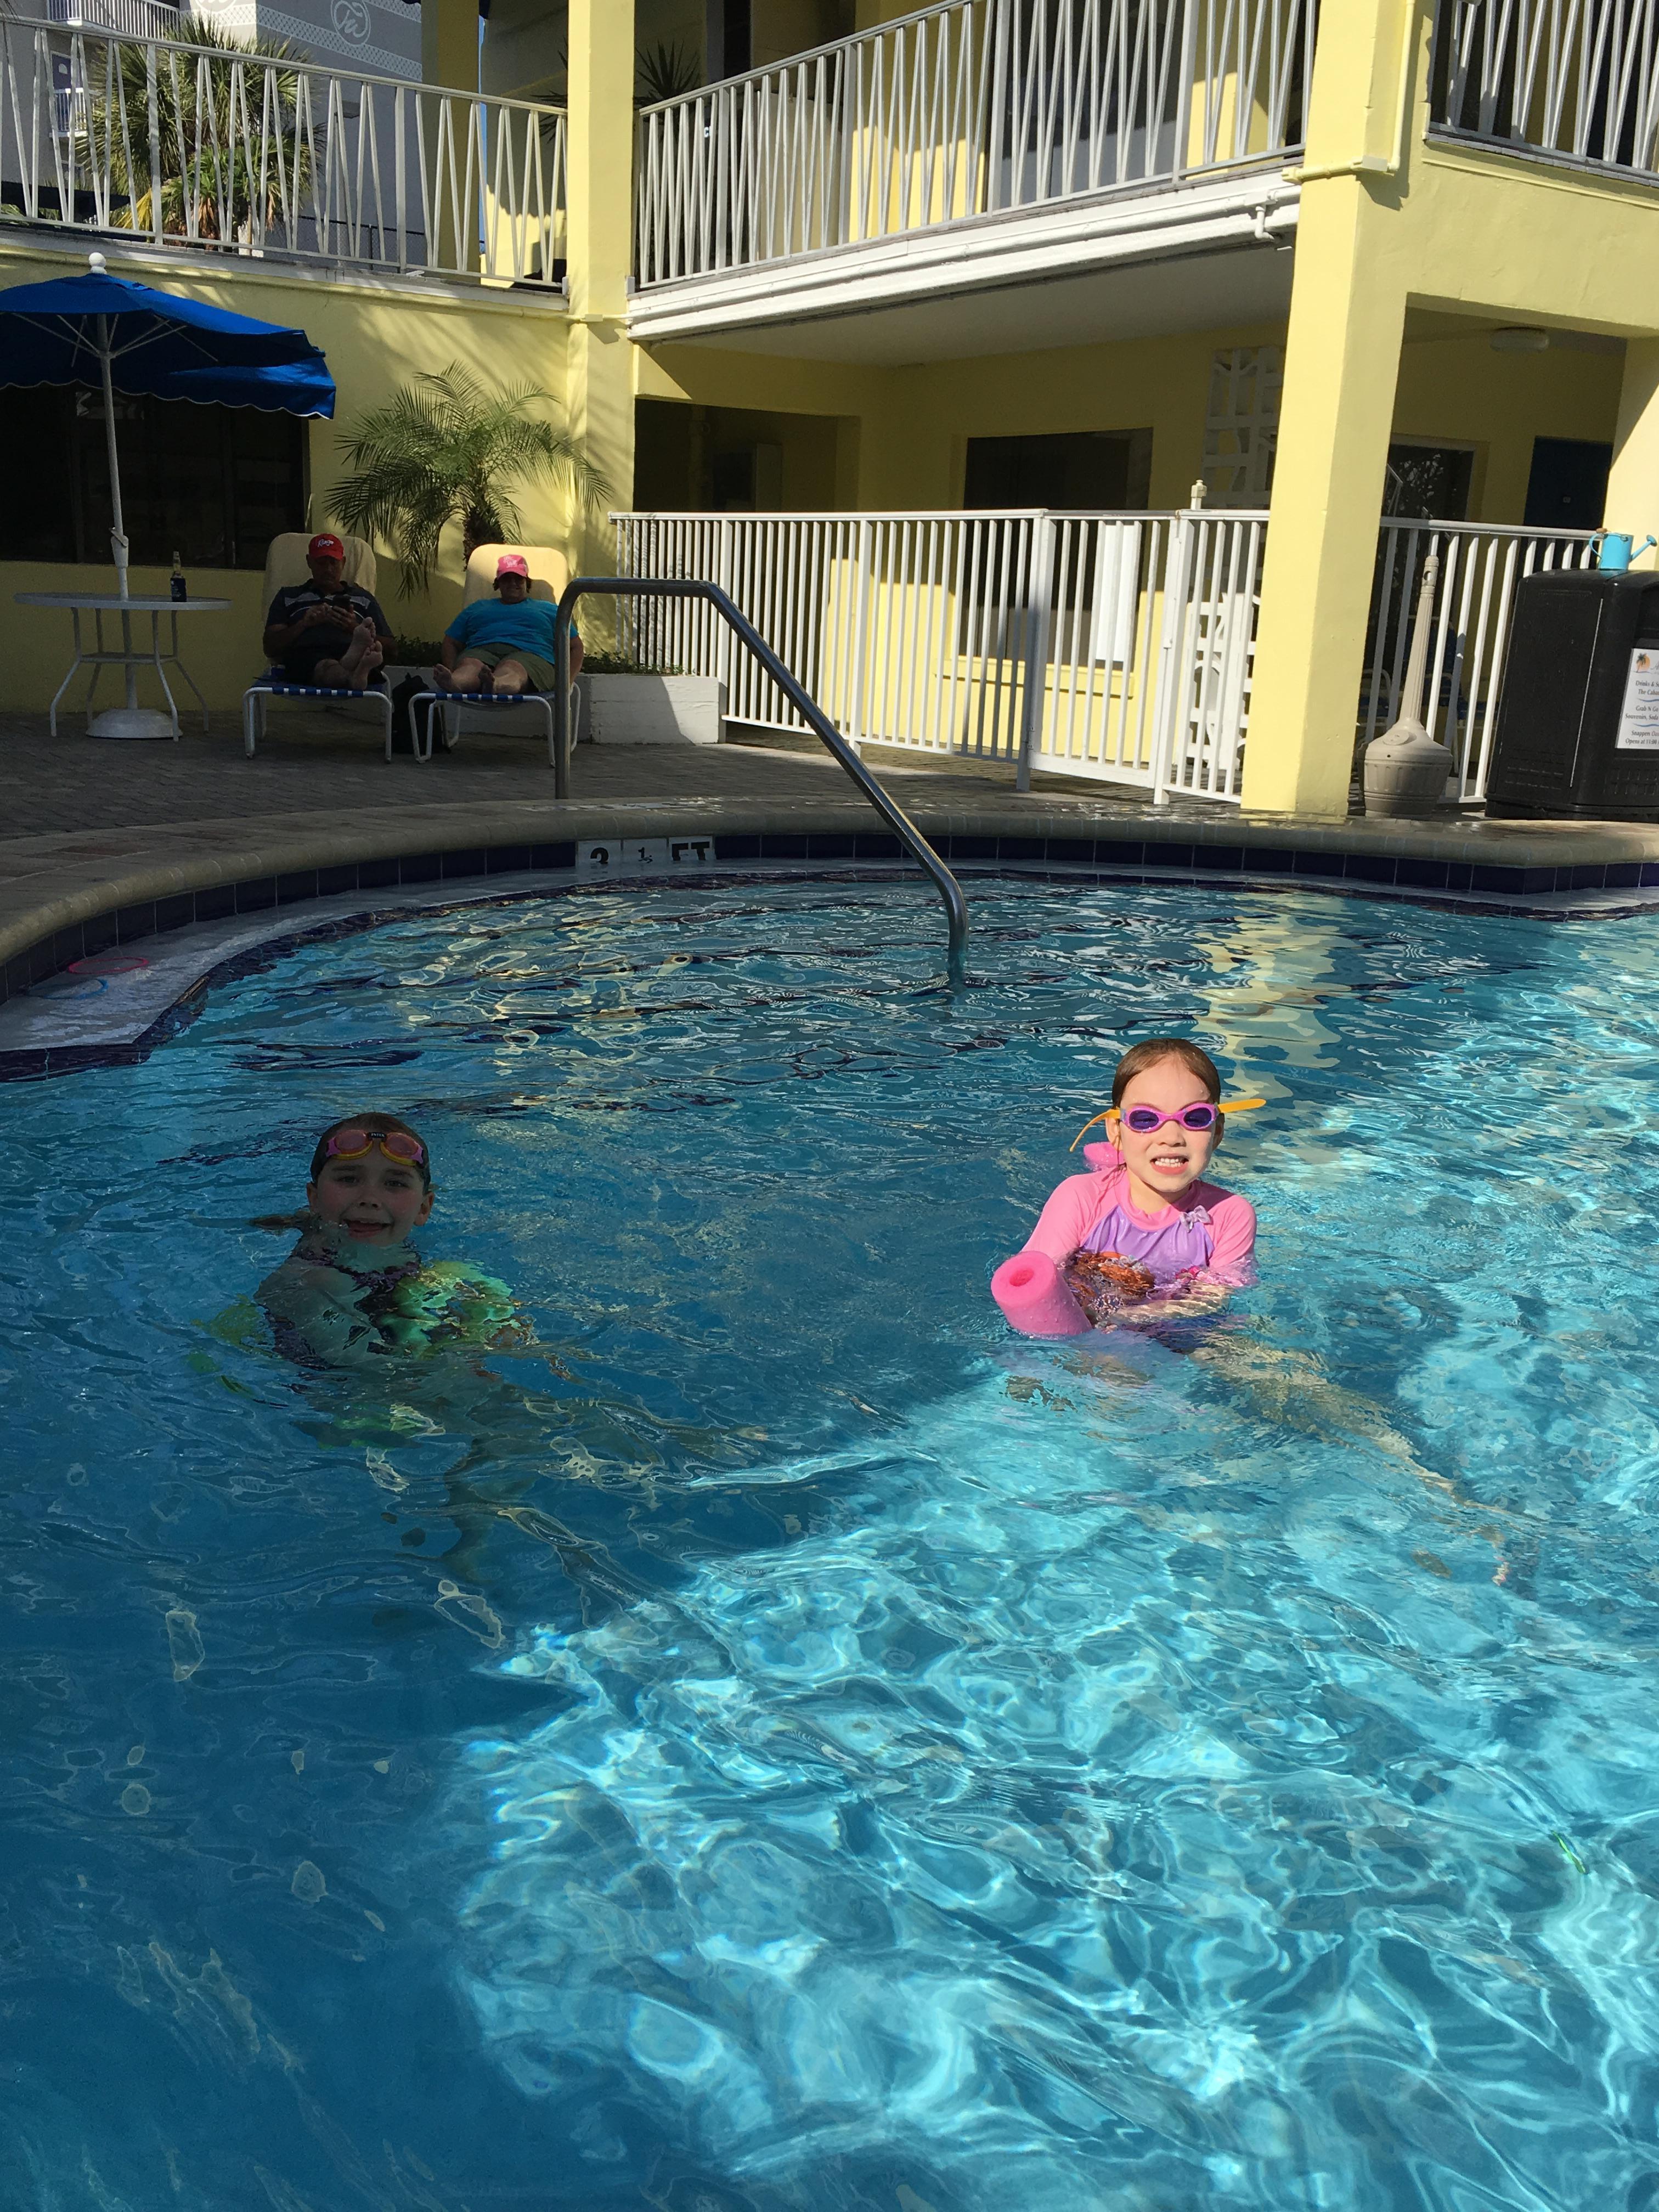 Clean, warm pools